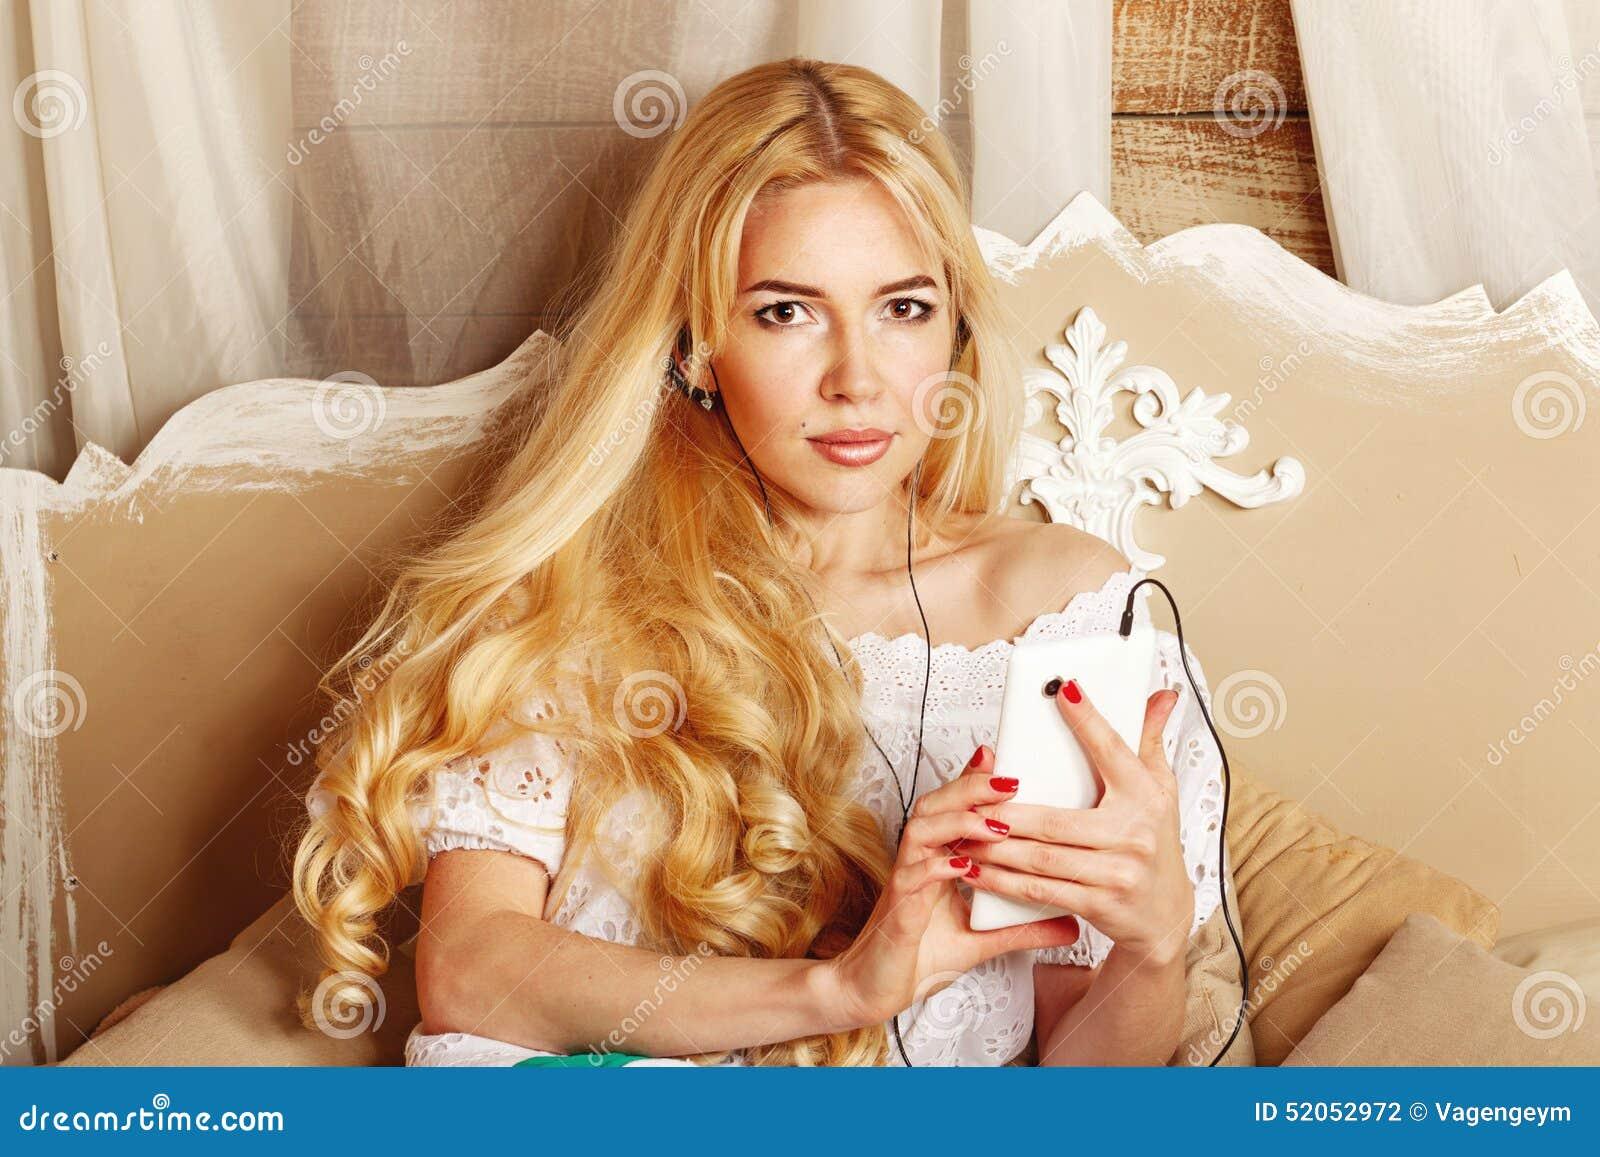 Meisje dat aan muziek op hoofdtelefoons luistert stock foto afbeelding 52052972 - Foto tiener ruimte meisje ...